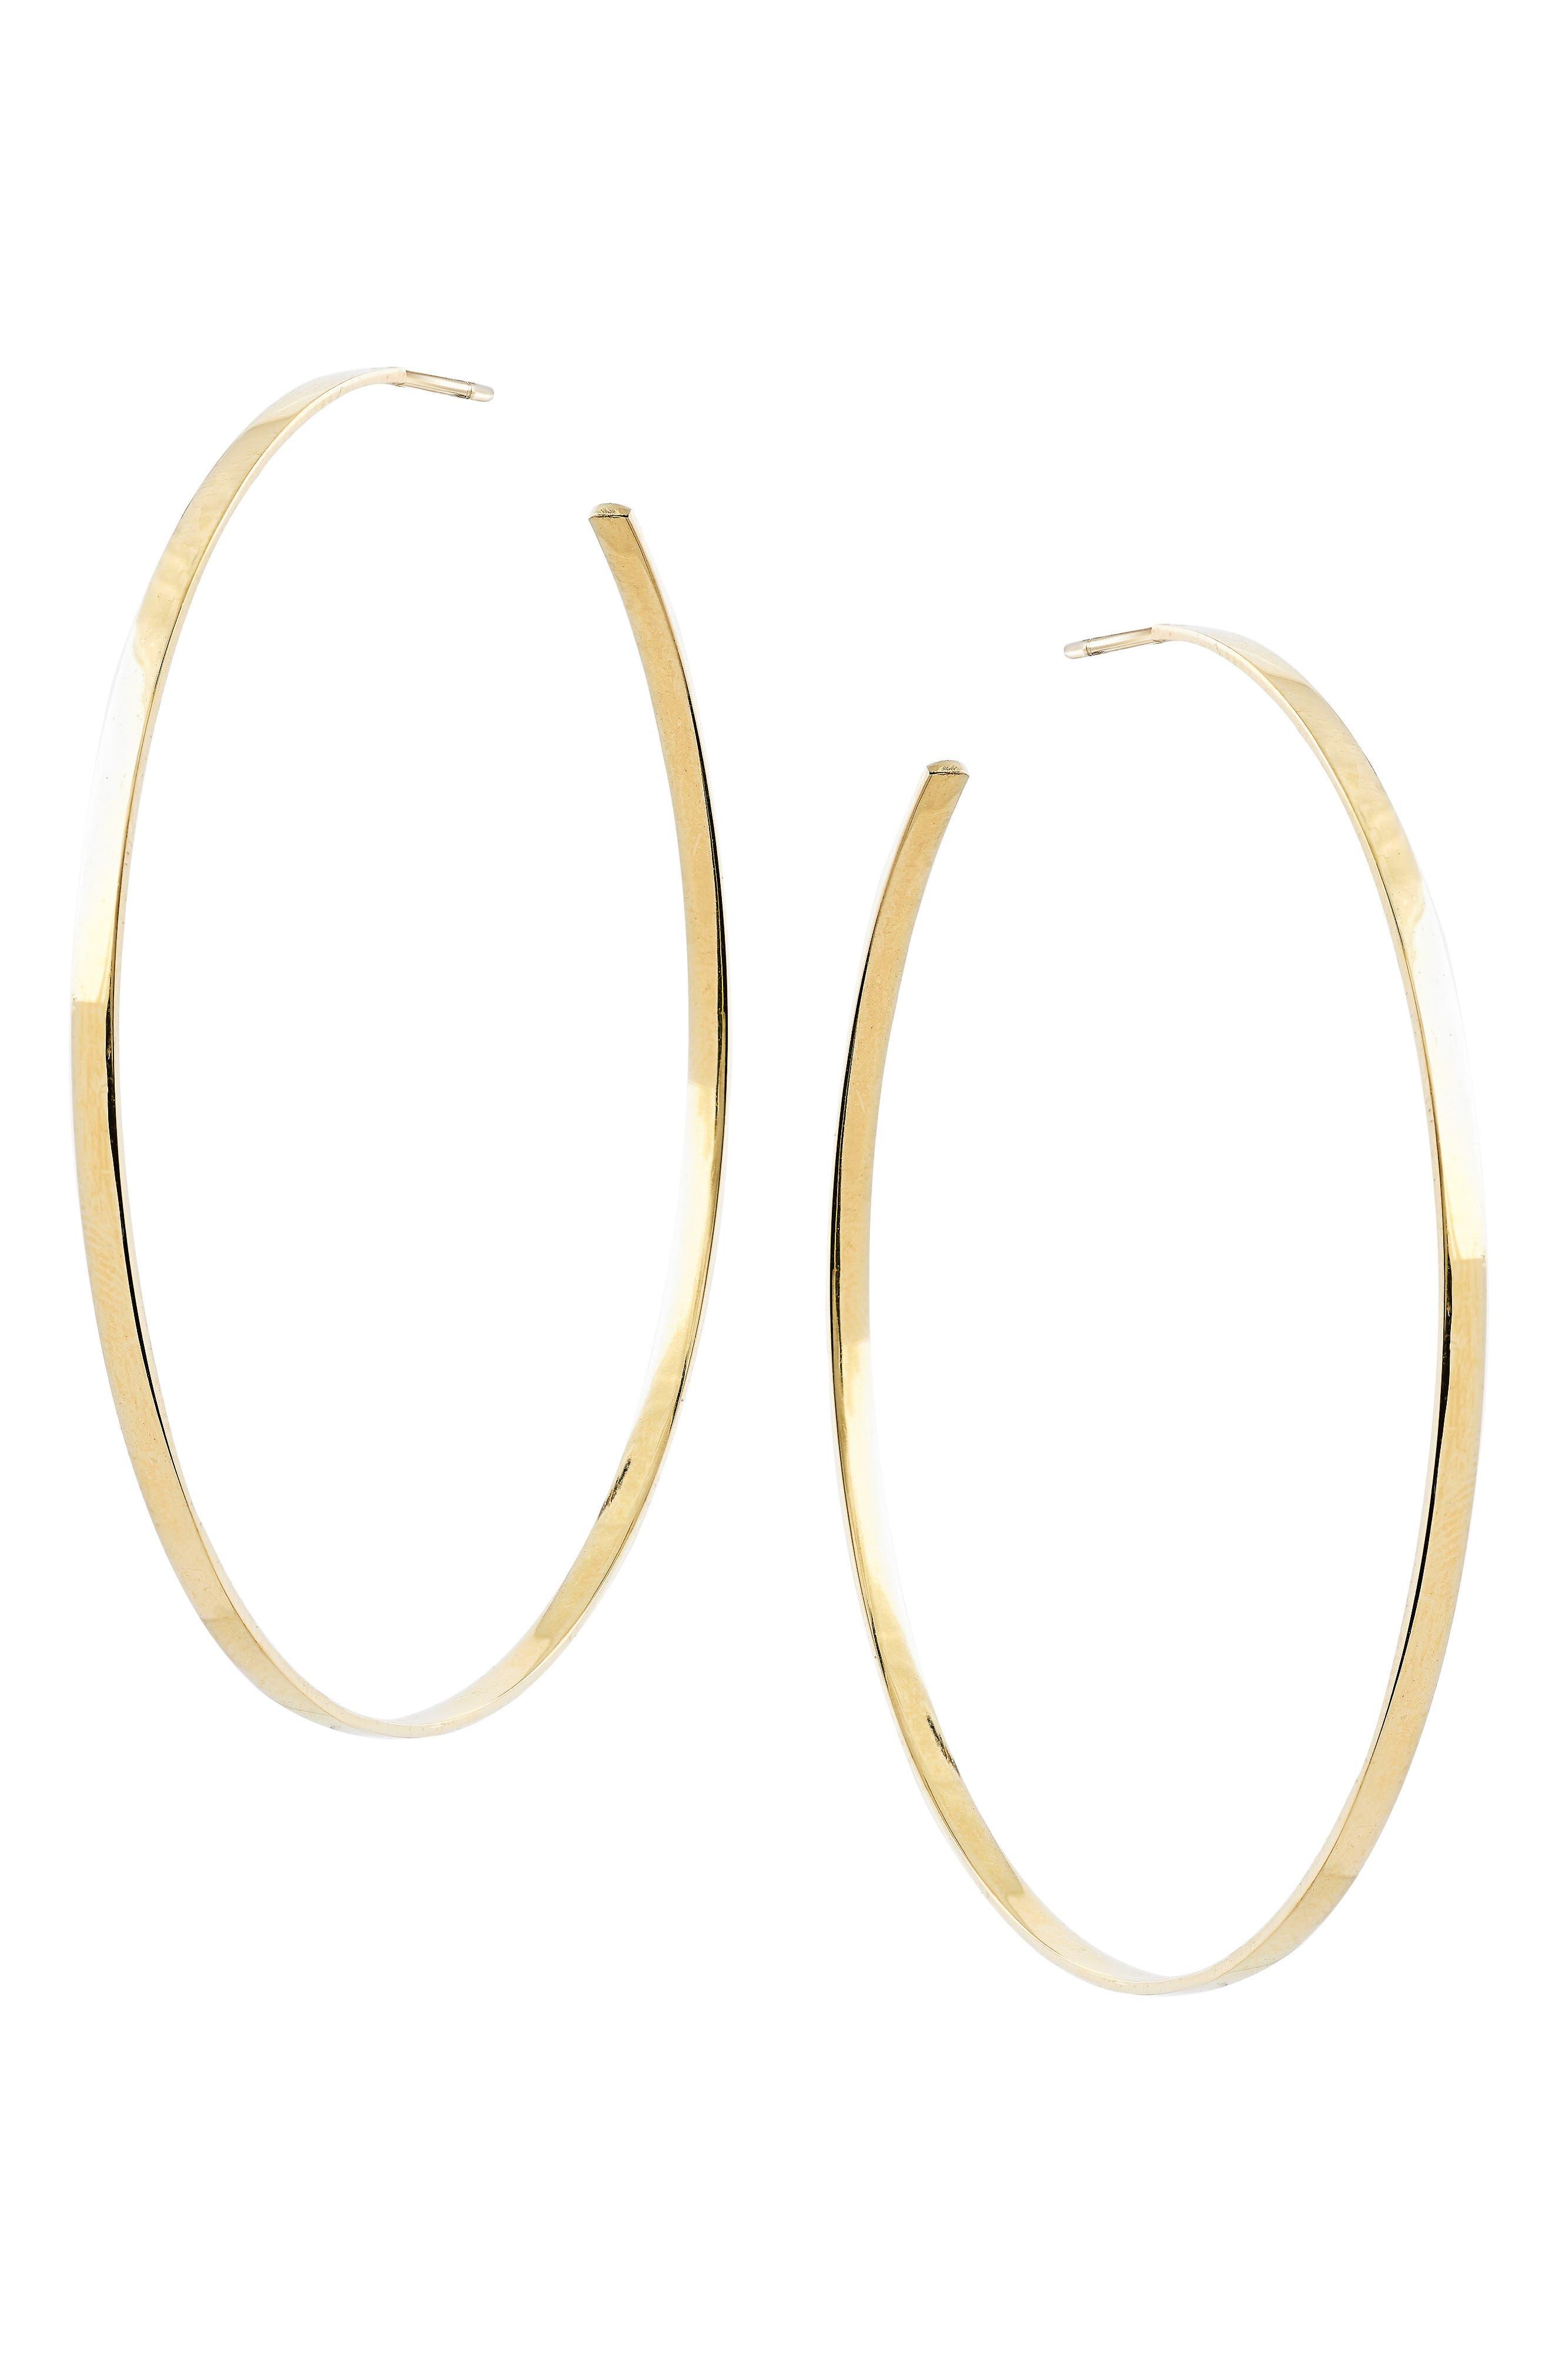 Main Image - Lana Jewelry Sunrise Hoop Earrings